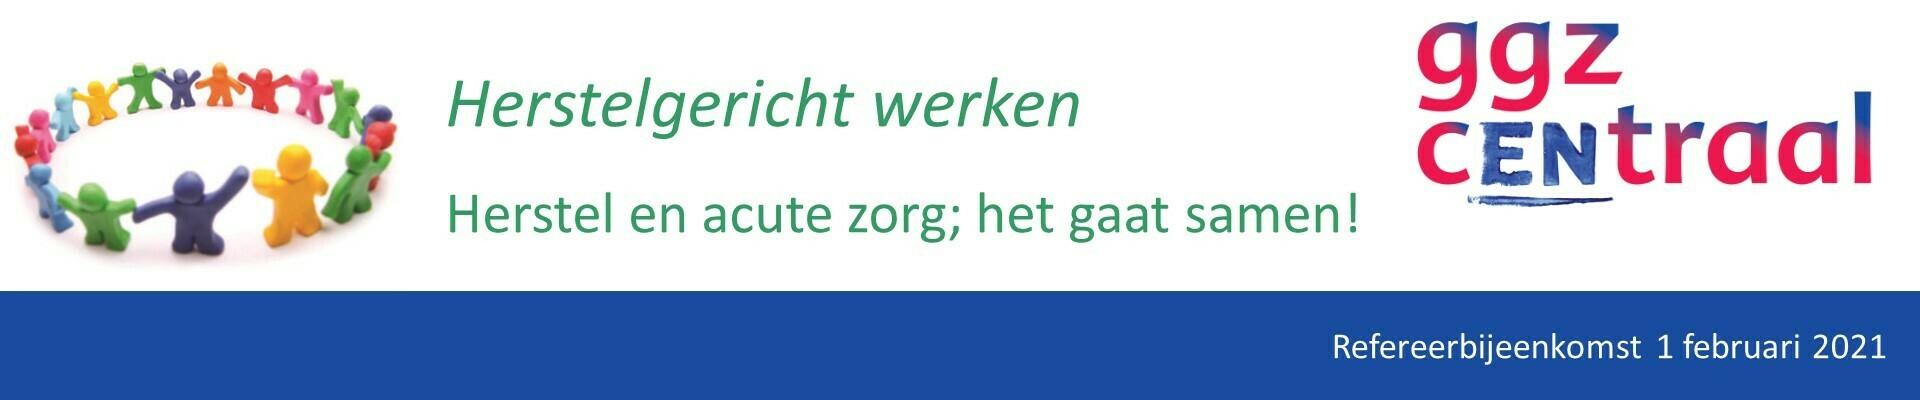 Refereerbijeenkomst 'Herstelgericht werken'